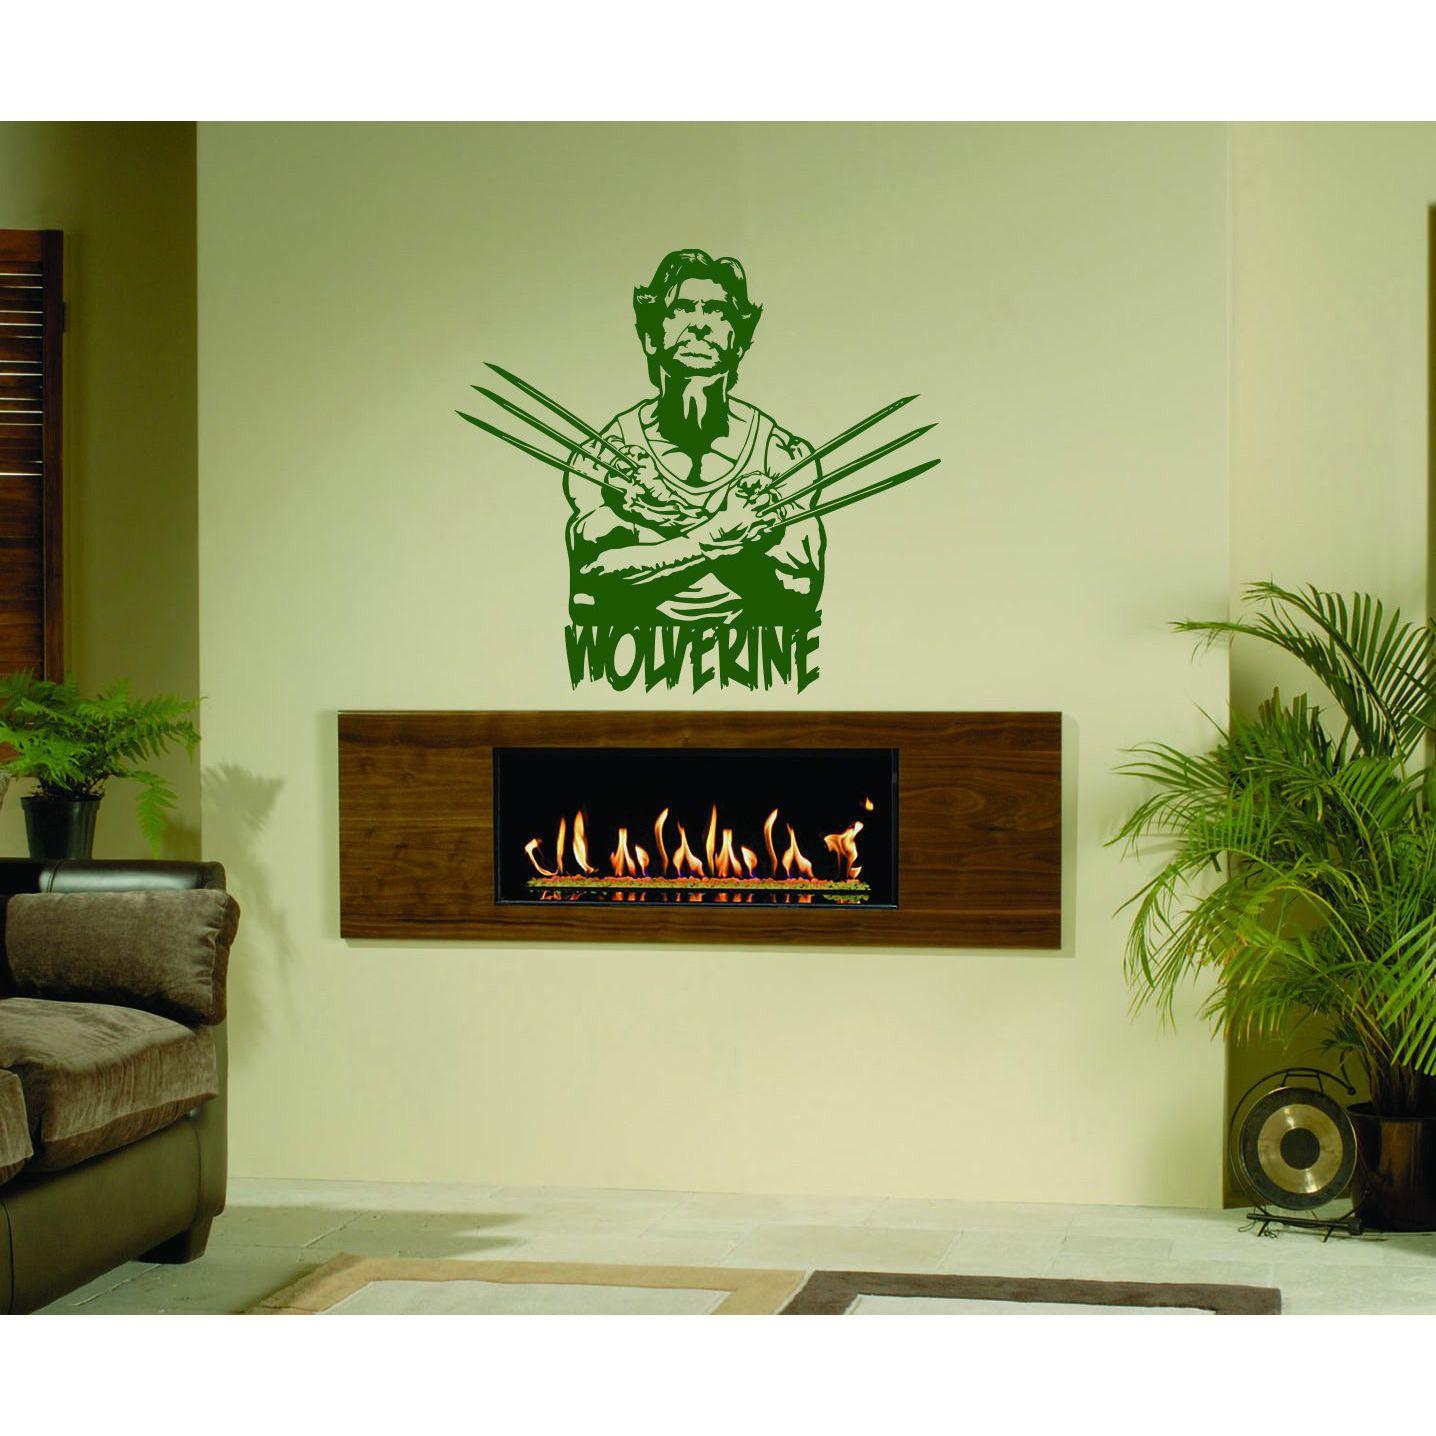 Fine Stylish Wall Art Component - All About Wallart - adelgazare.info